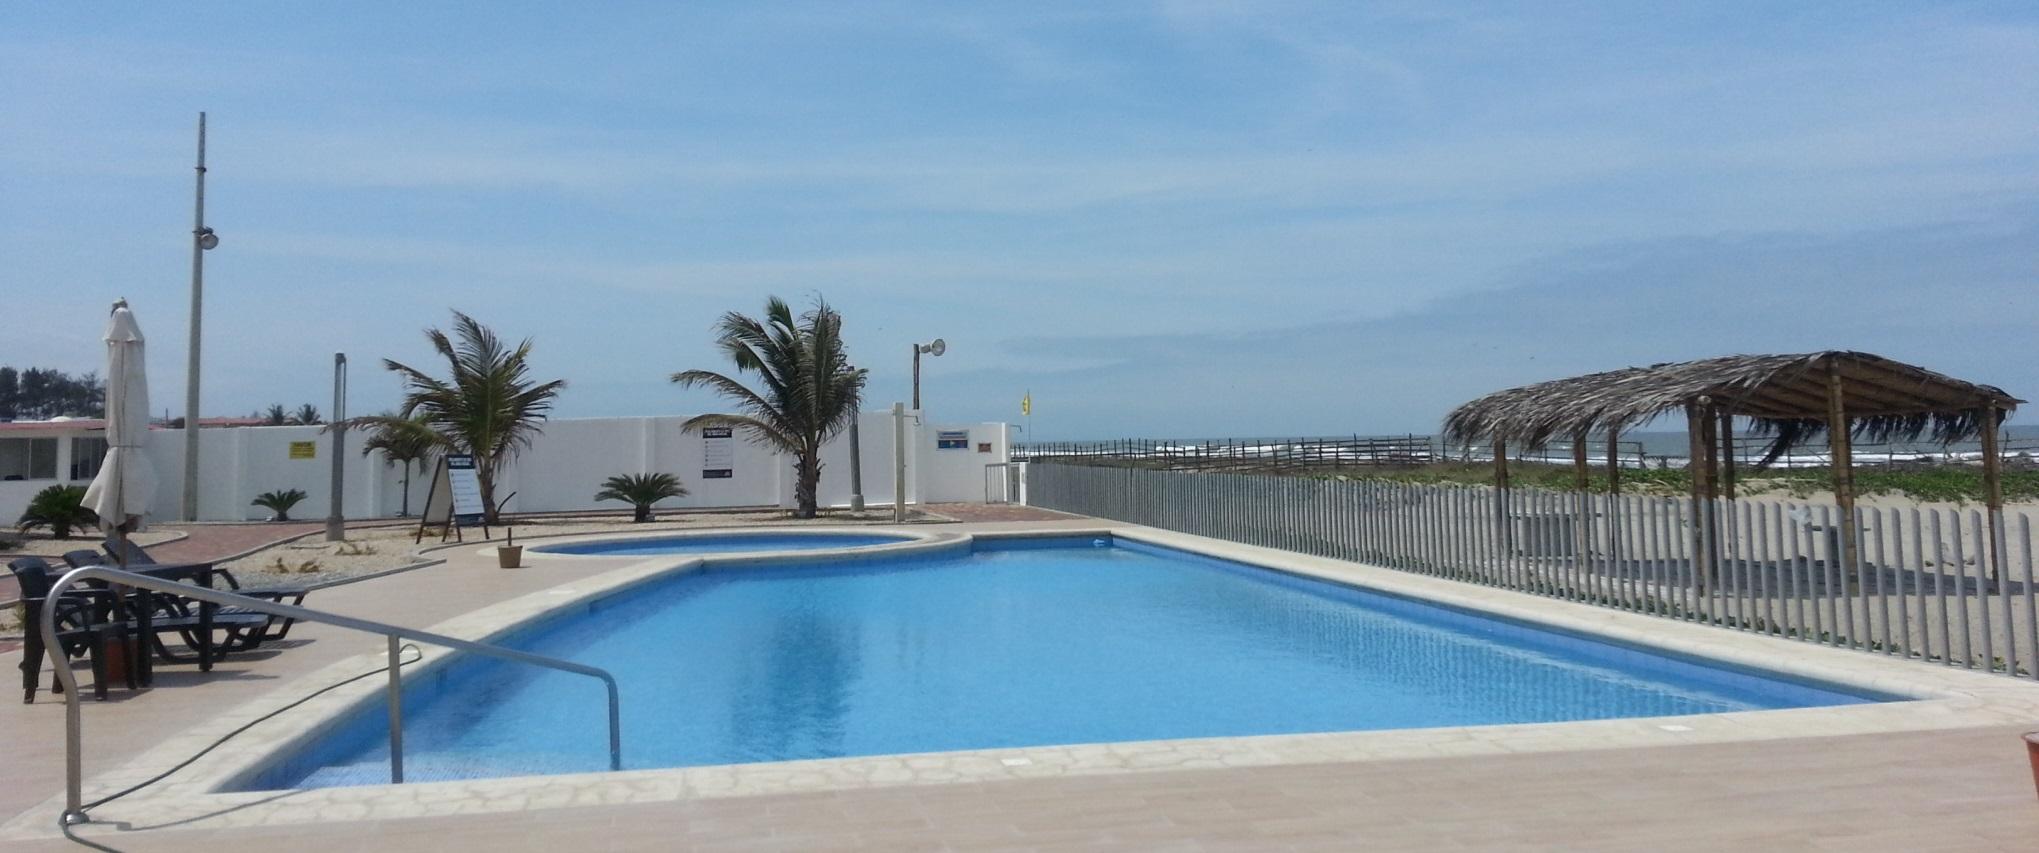 Playas villamil alquiler de hermosa casa vacacional for Alquiler piscina